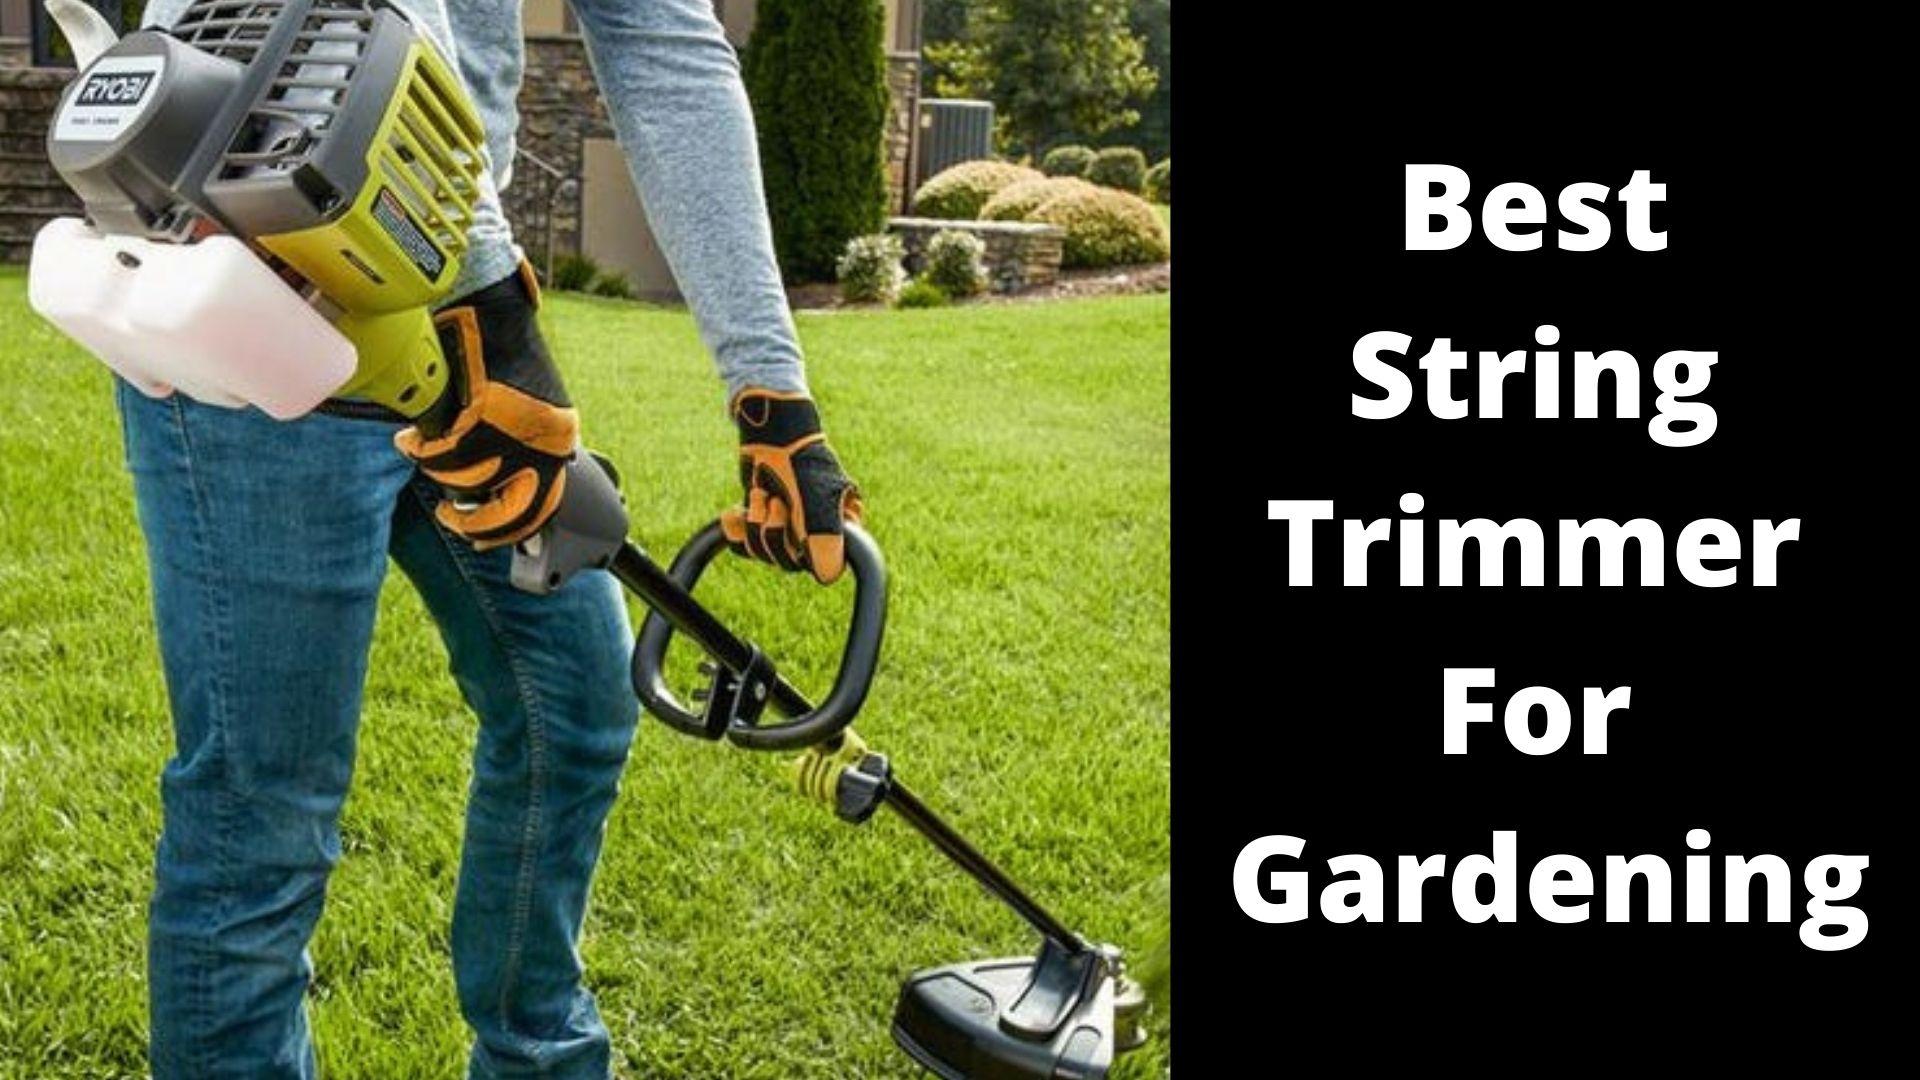 Best String Trimmer For Gardening